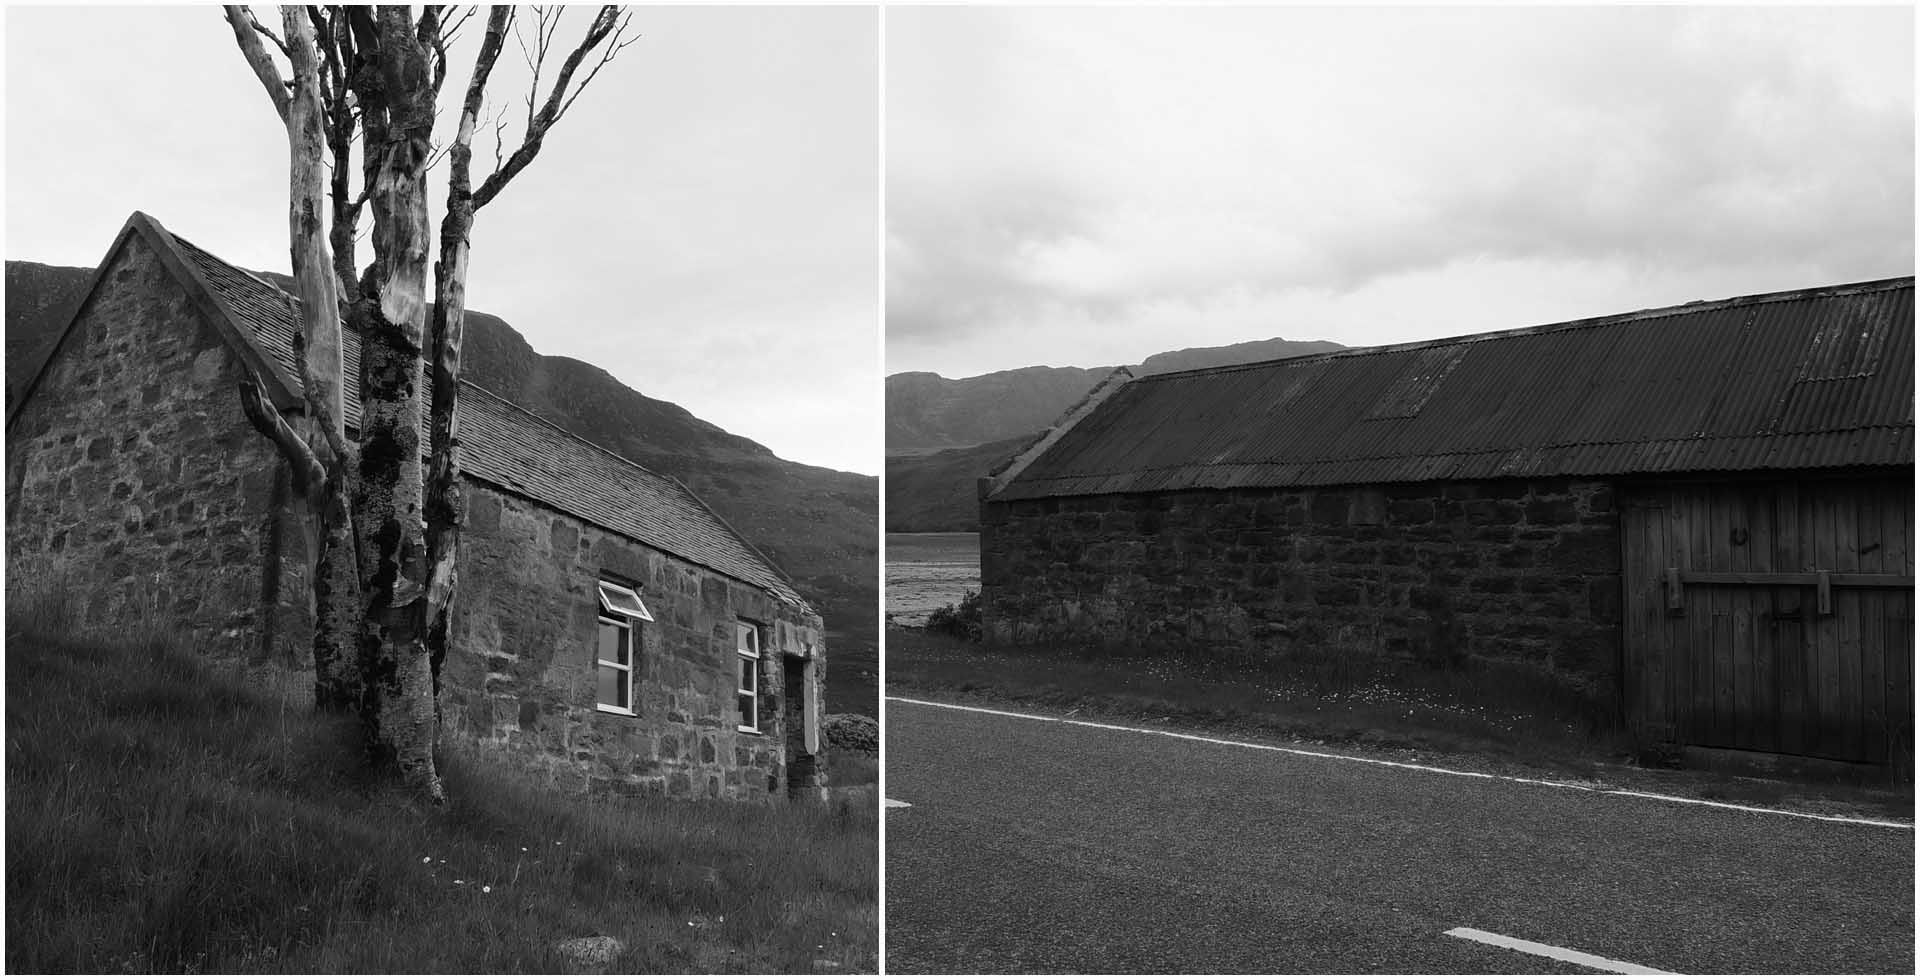 route wesetr ross ecosse scotland